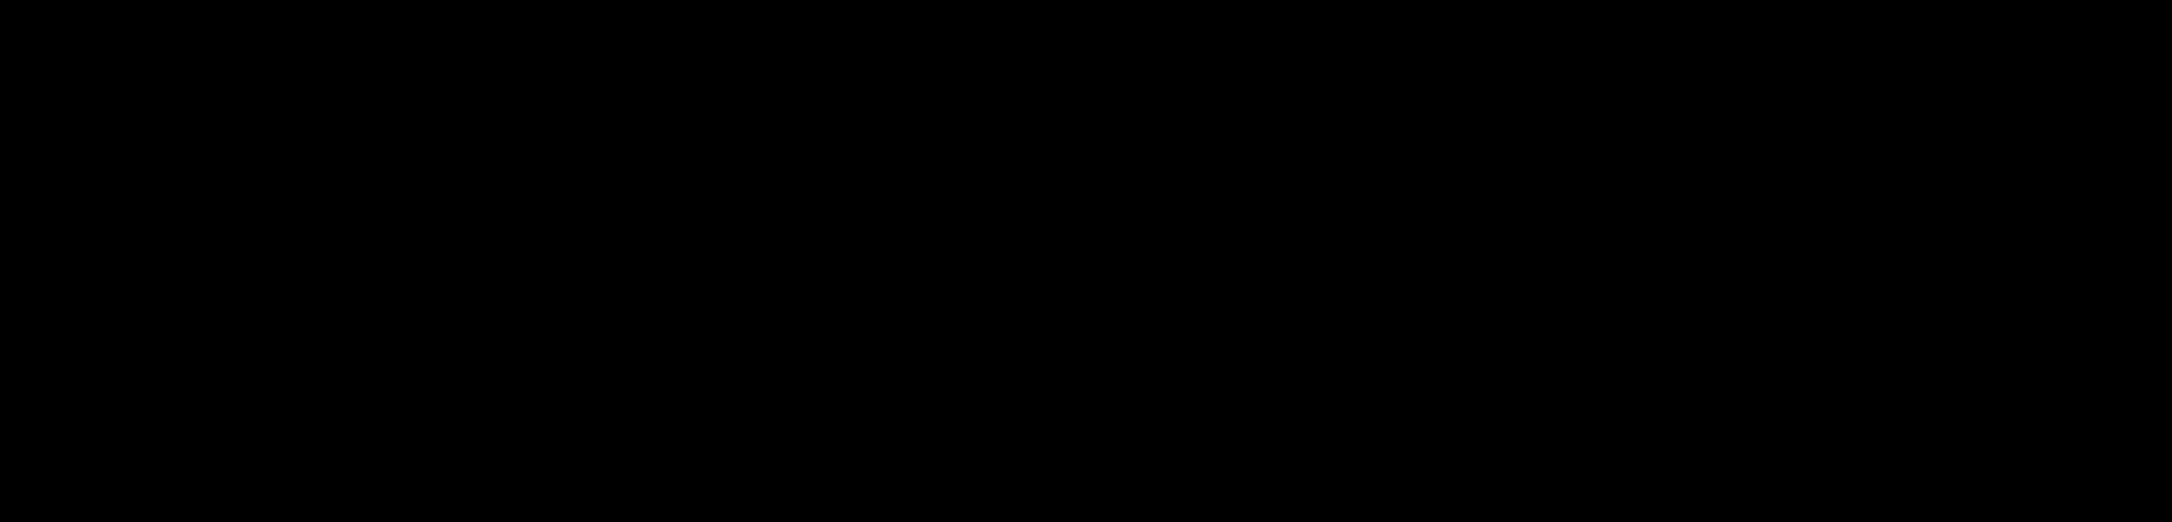 Engagis-Mono-Black (1)